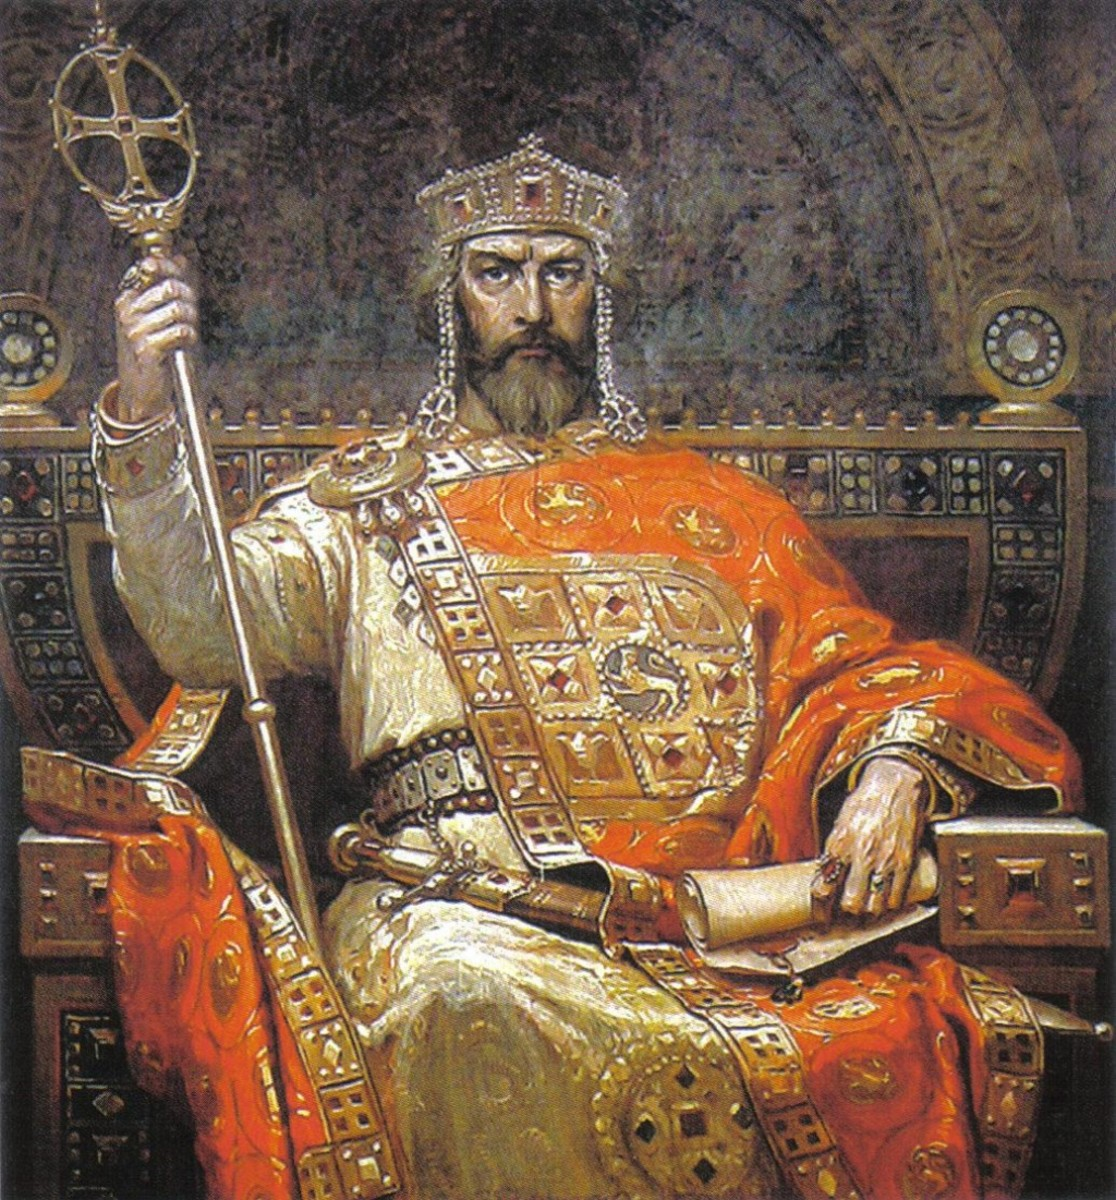 The emperor Nikophoras II Phokas, ruled  963-969 prior to Basil II